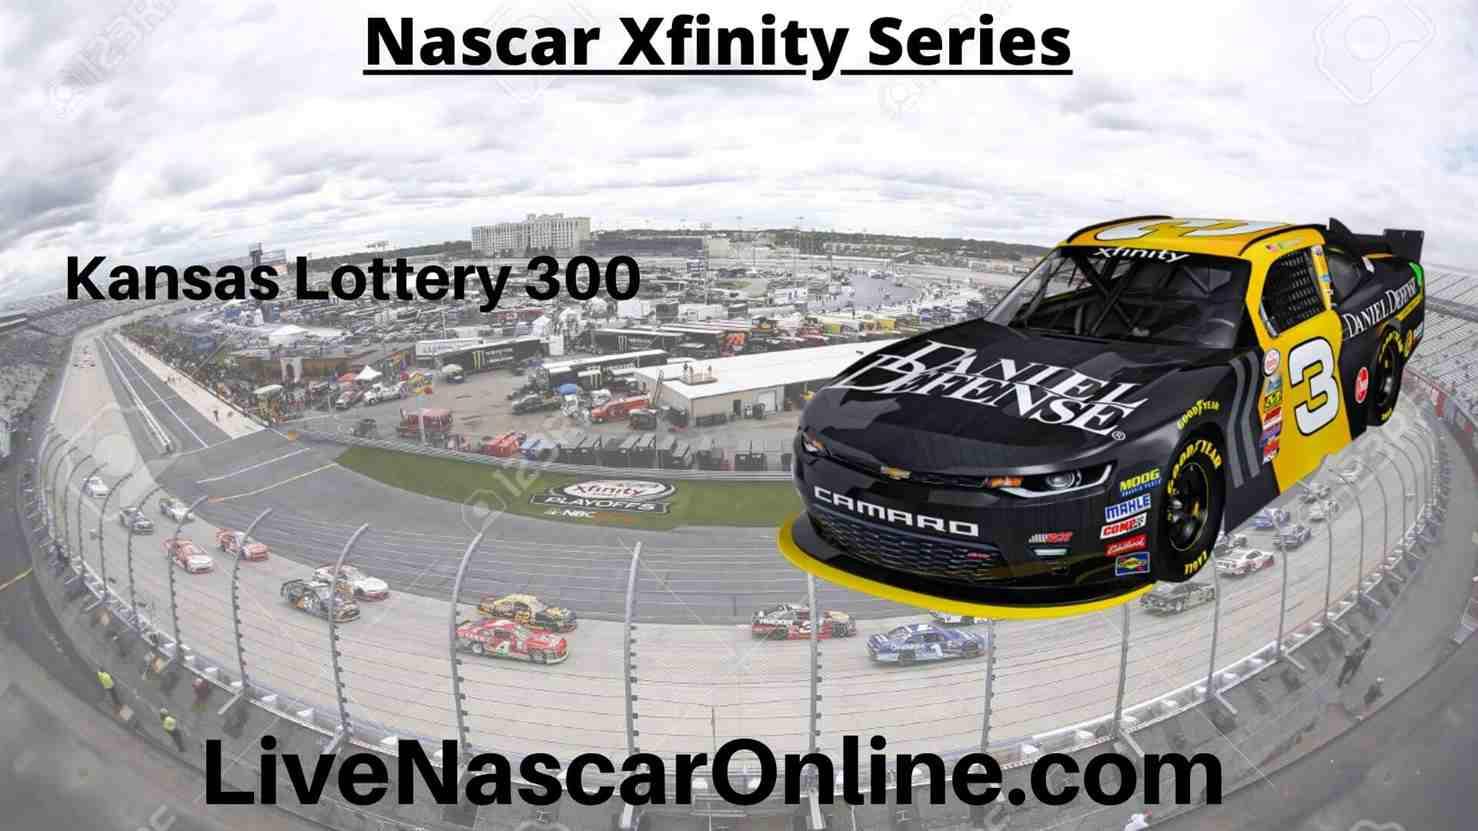 Kansas Lottery 300 Online Stream | NASCAR Kansas 2020